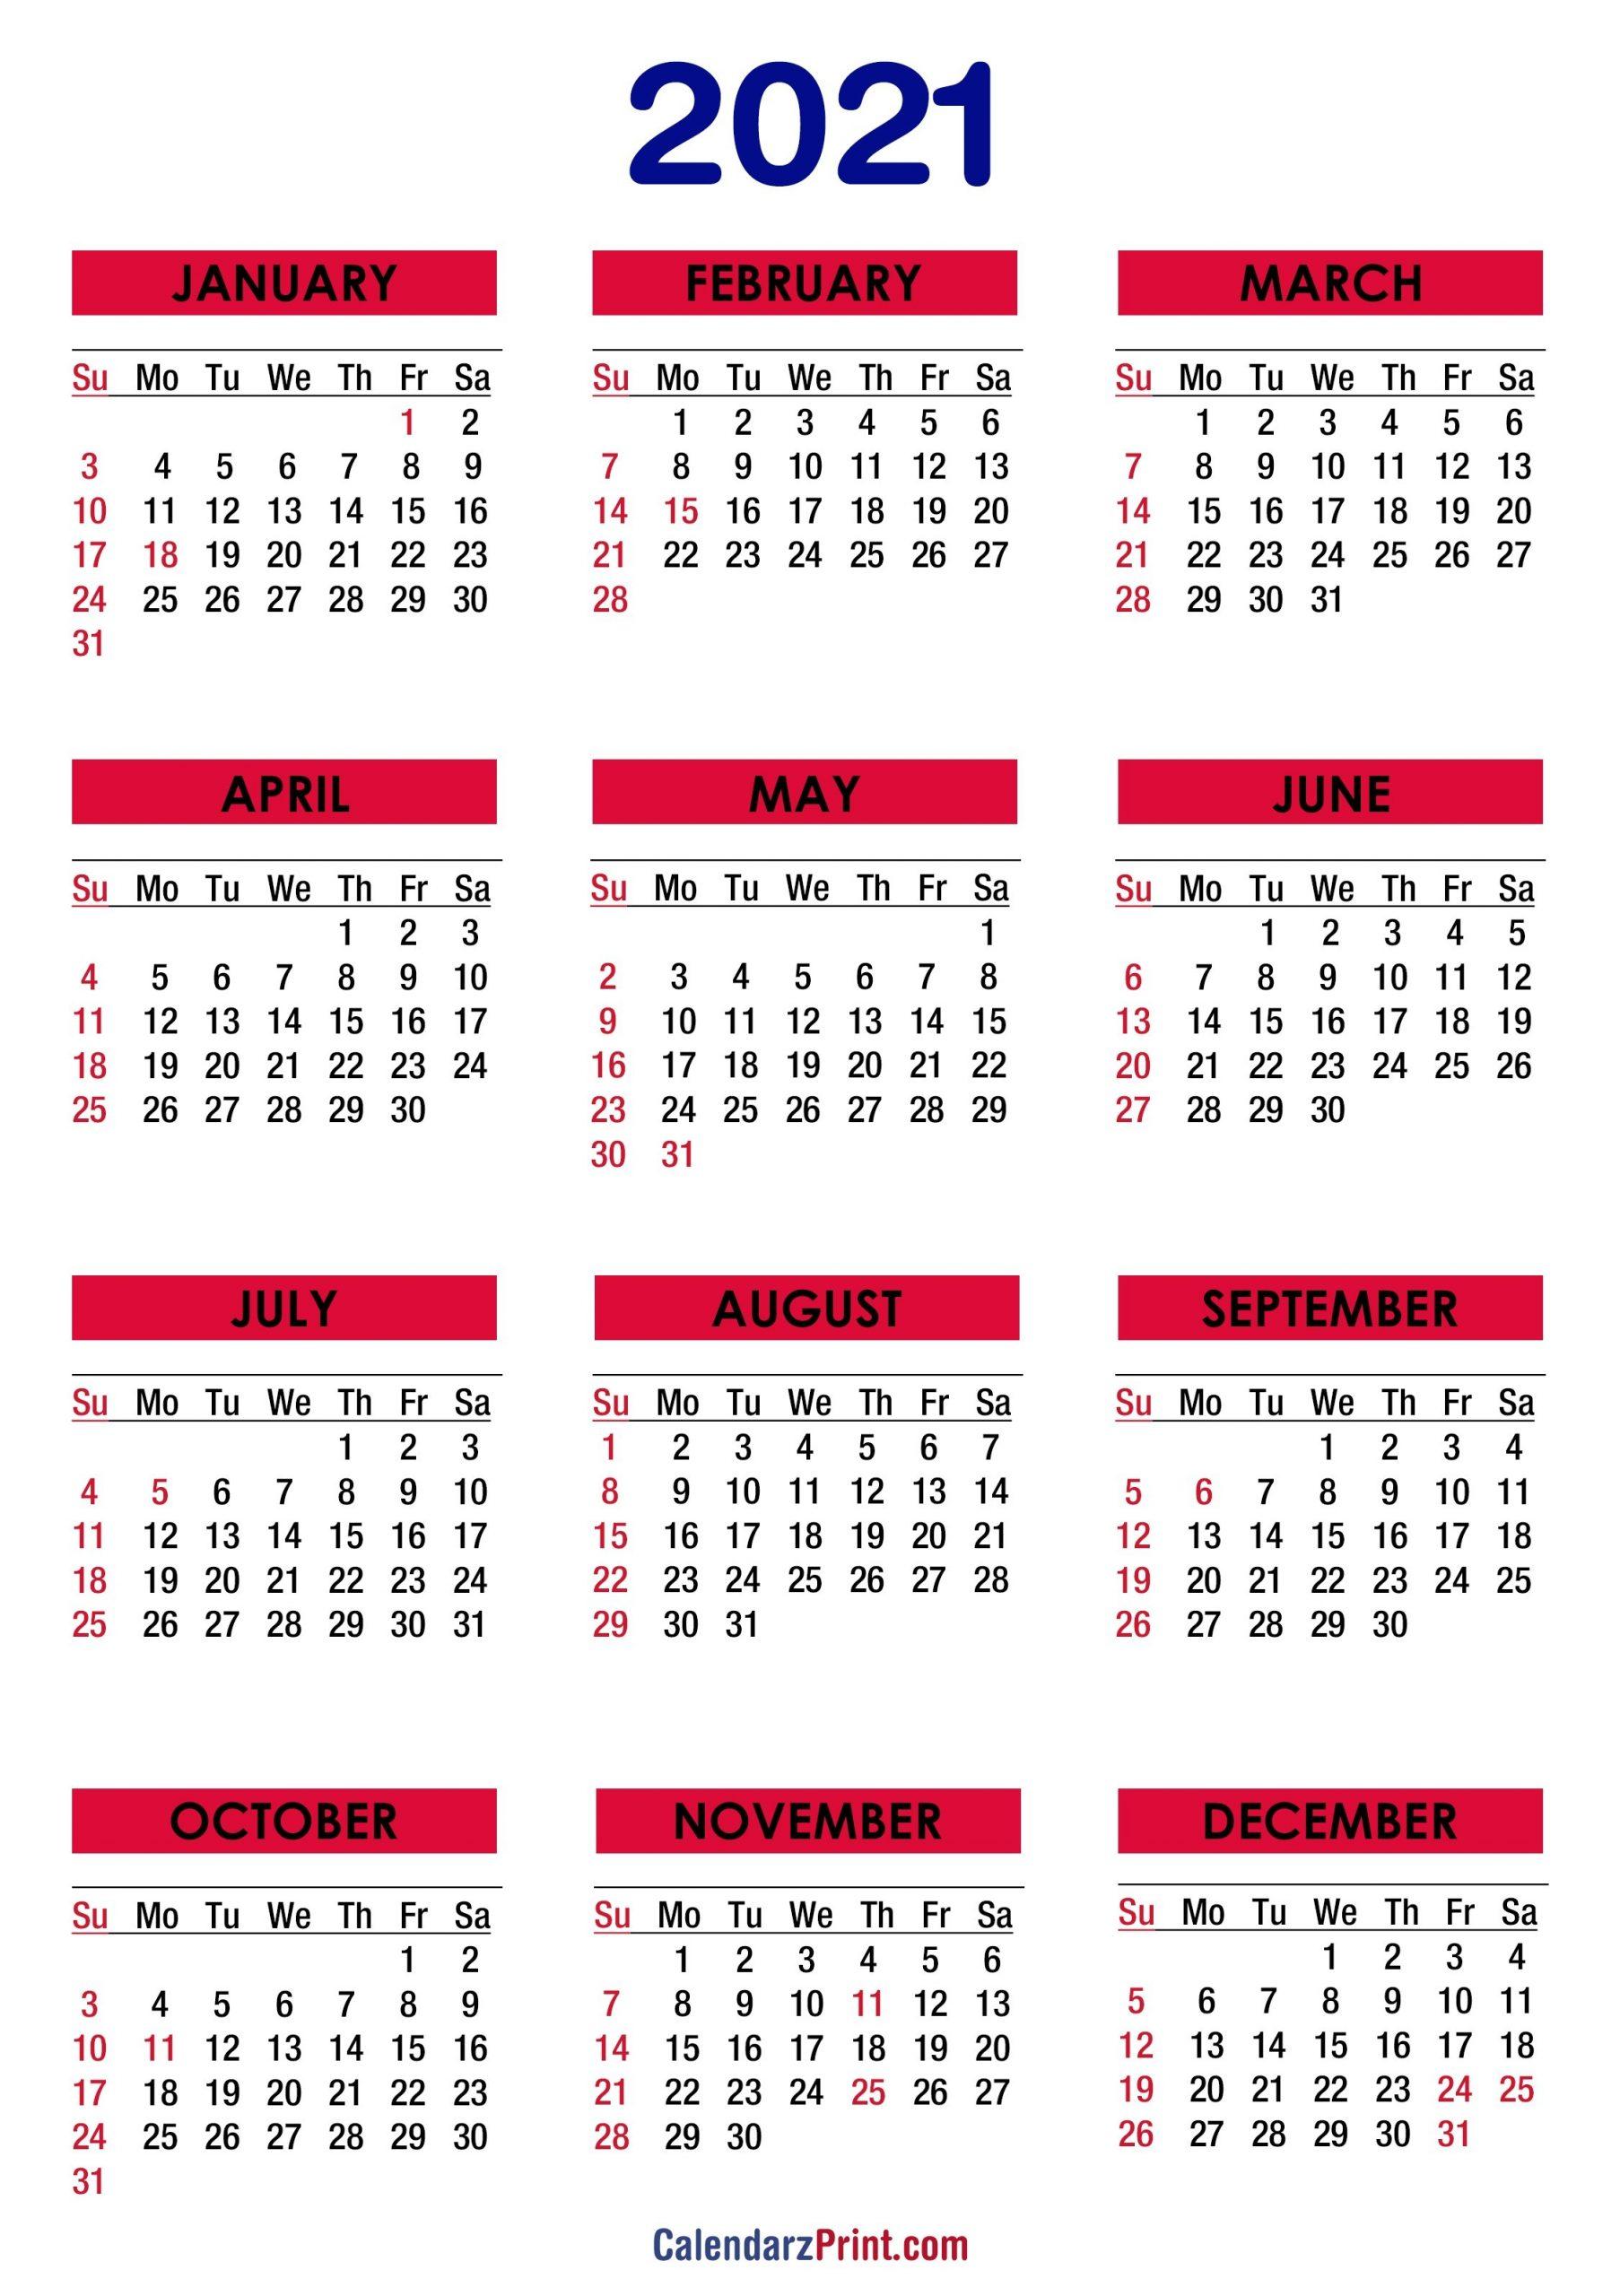 2021 Calendar Printable Free Pdf - 2021 Calendar Printable Free White Sunday Start Matildastory for Free Printable Calendarlabs 2021